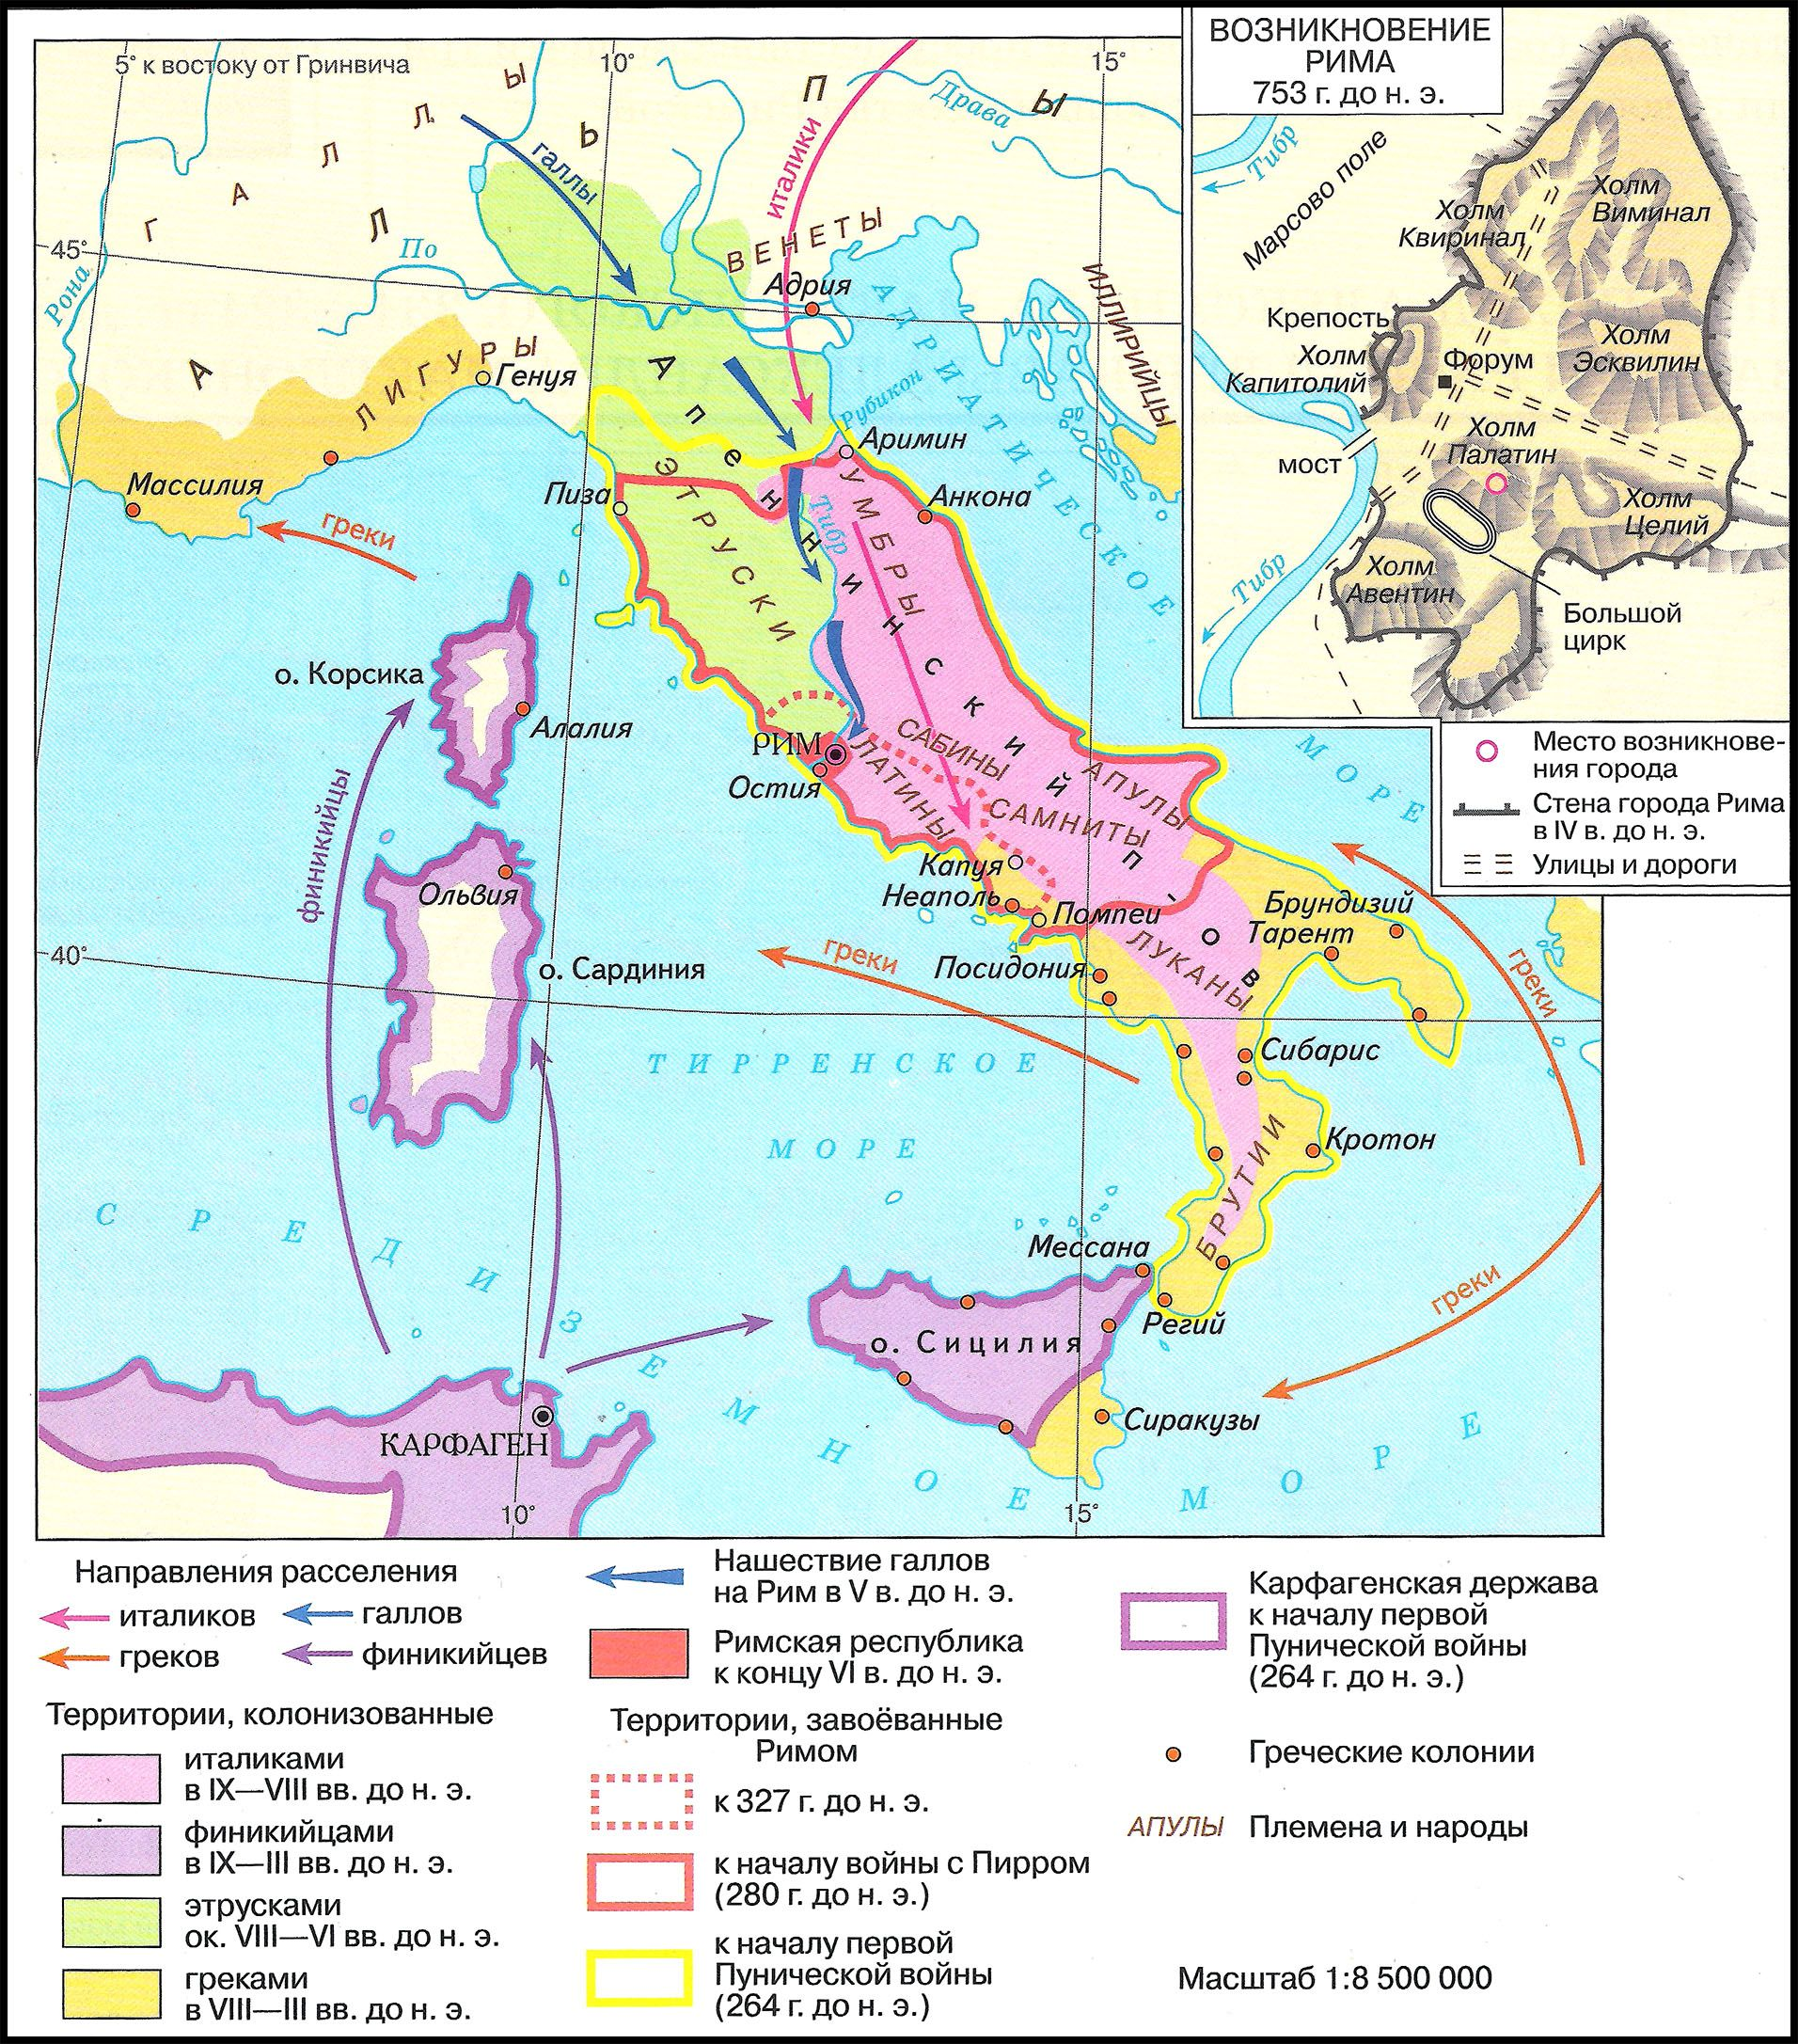 Древняя Италия, начало I тысячелетия - середина III в. до н.э.